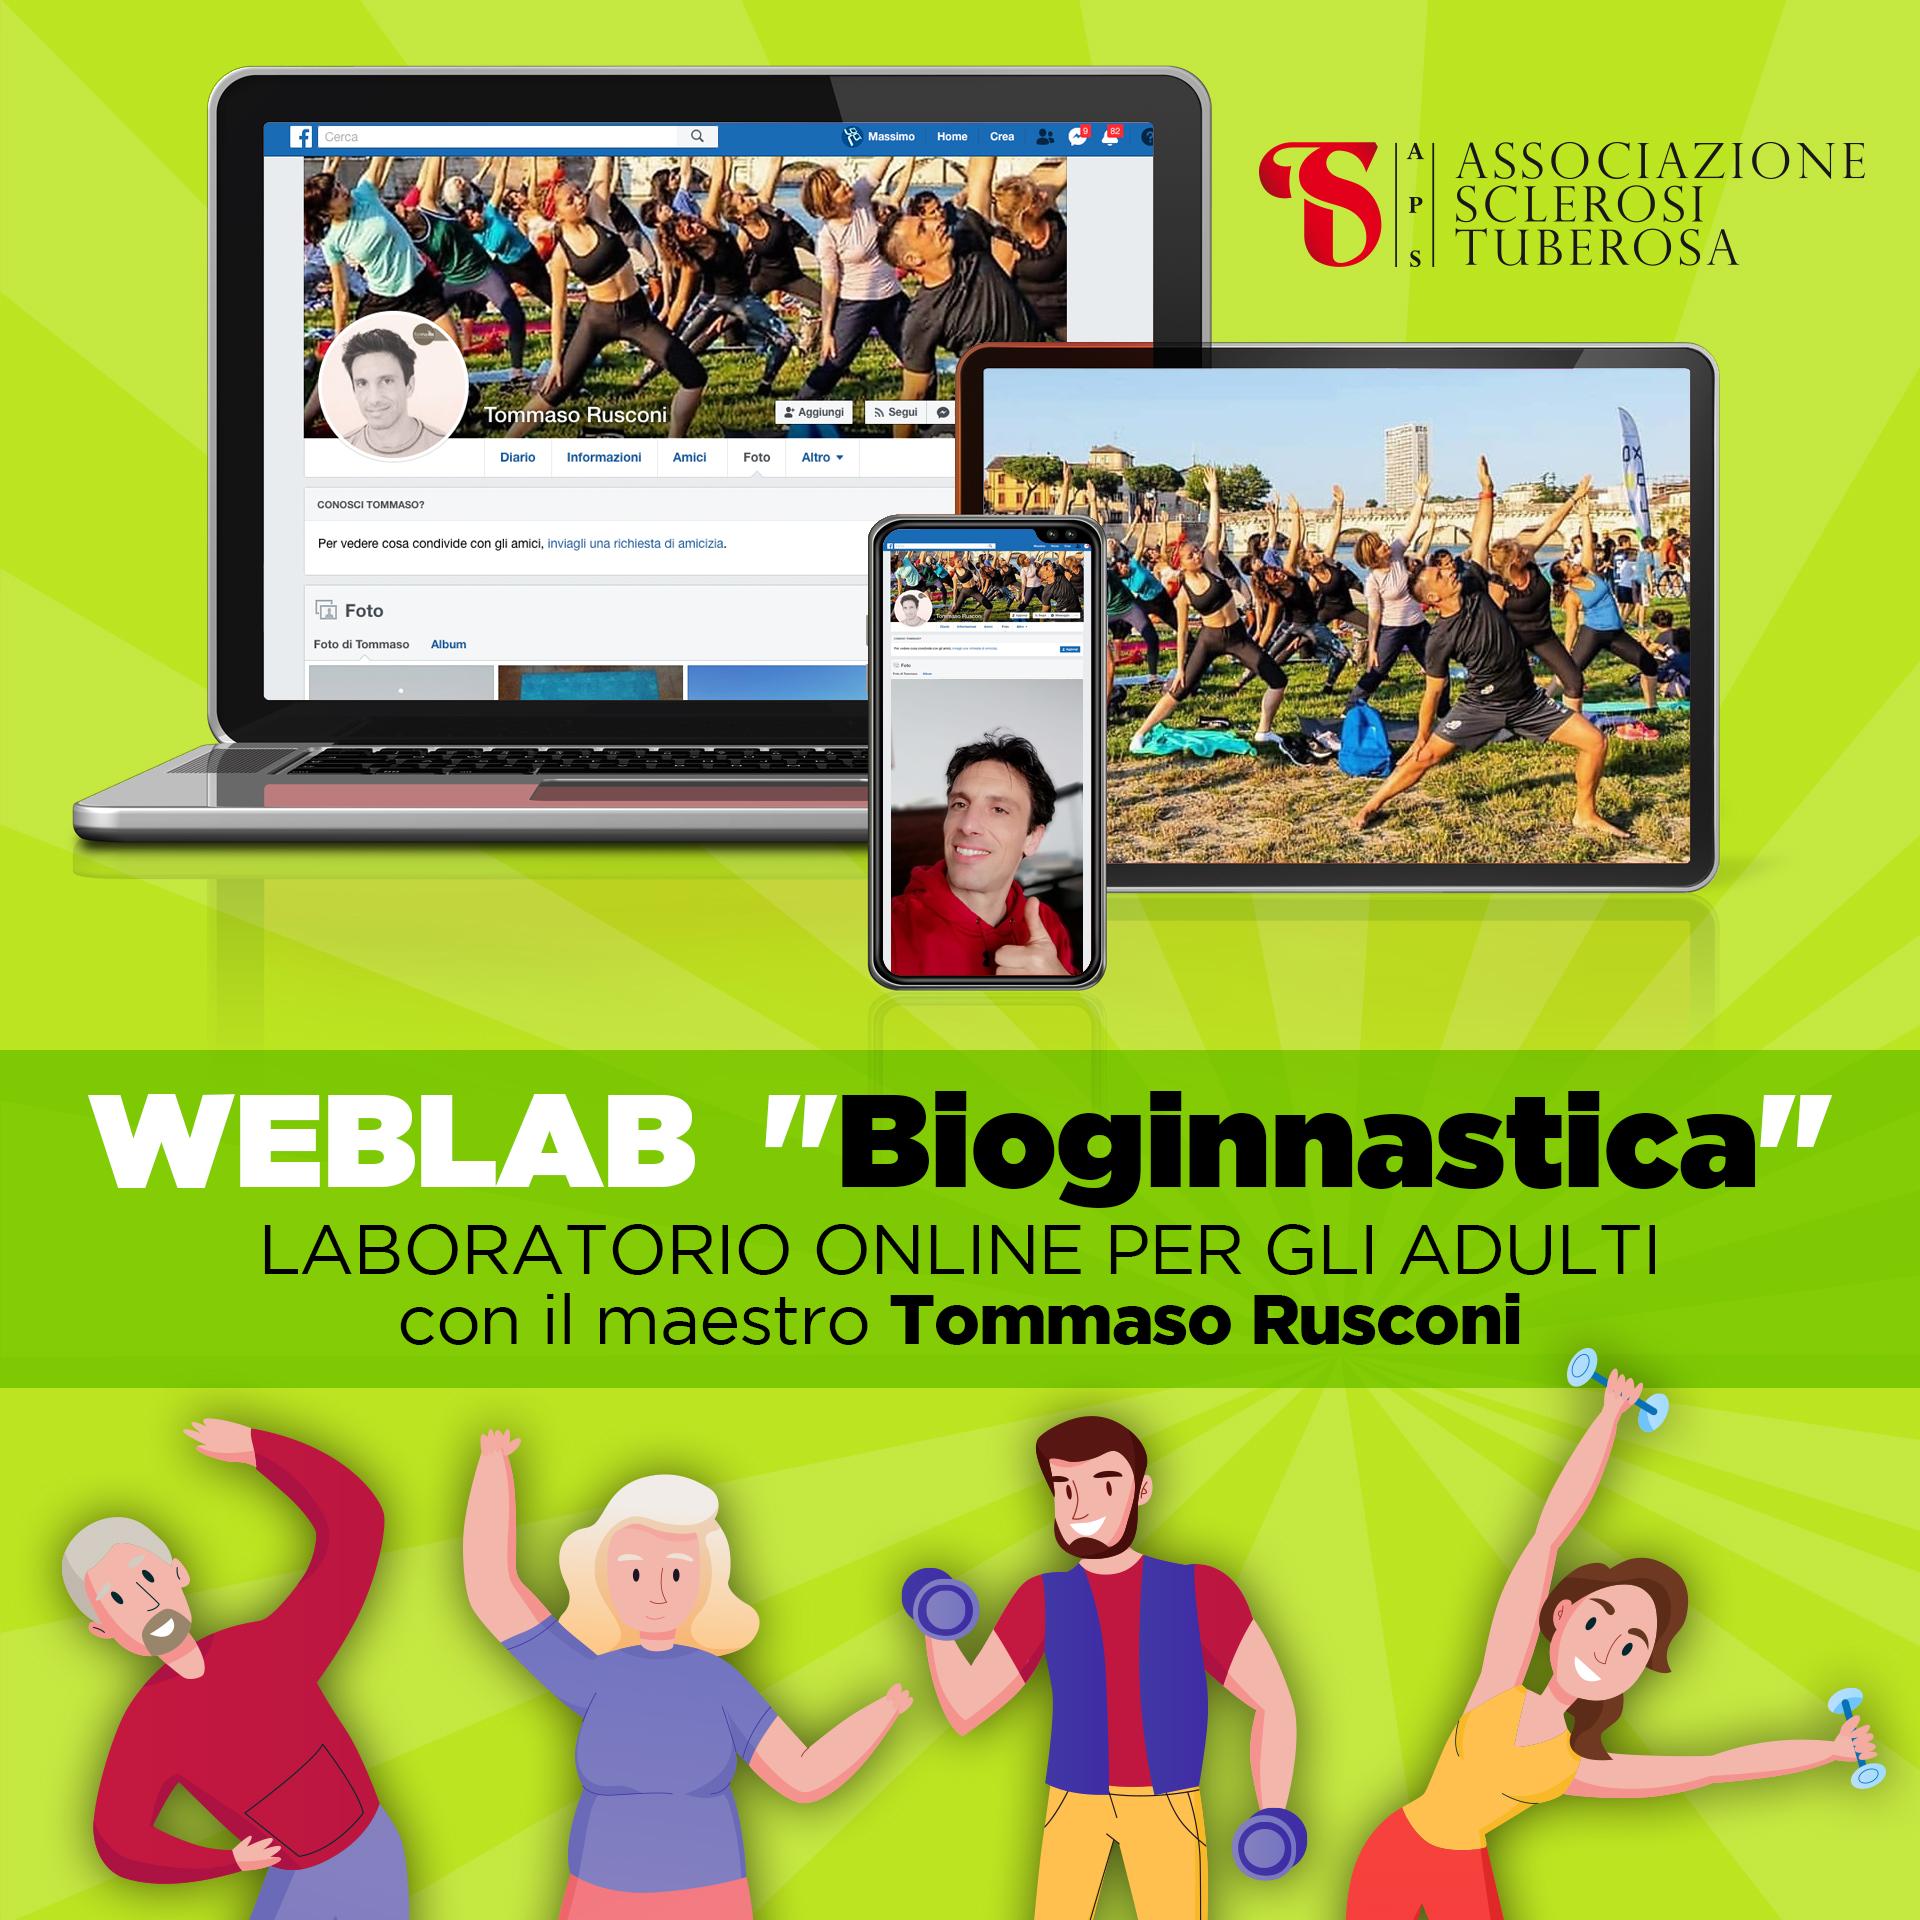 Weblab di bioginnastica